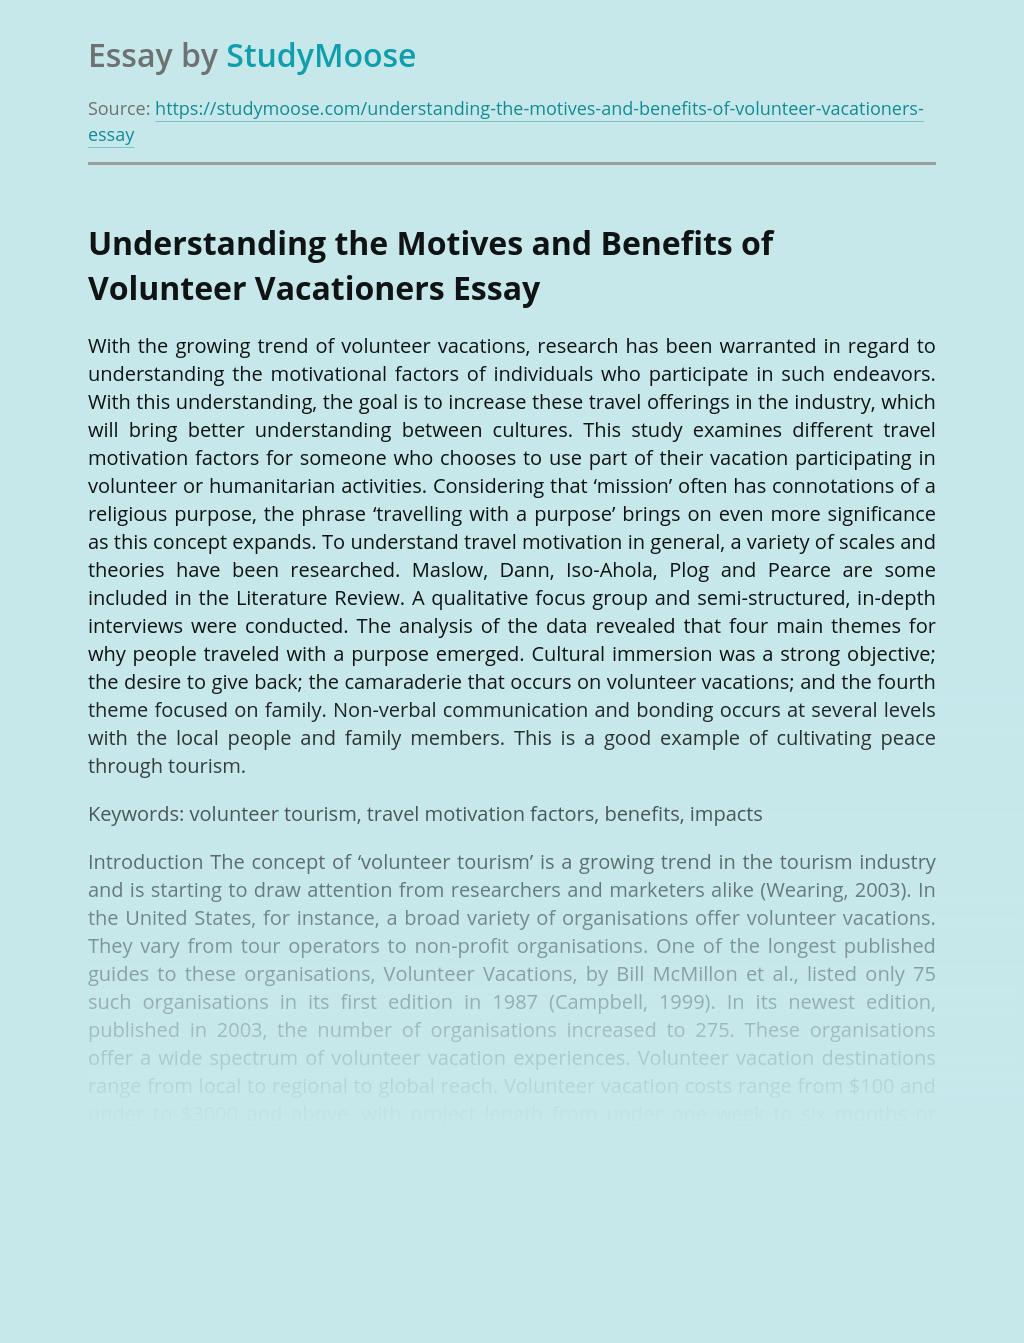 Understanding the Motives and Benefits of Volunteer Vacationers